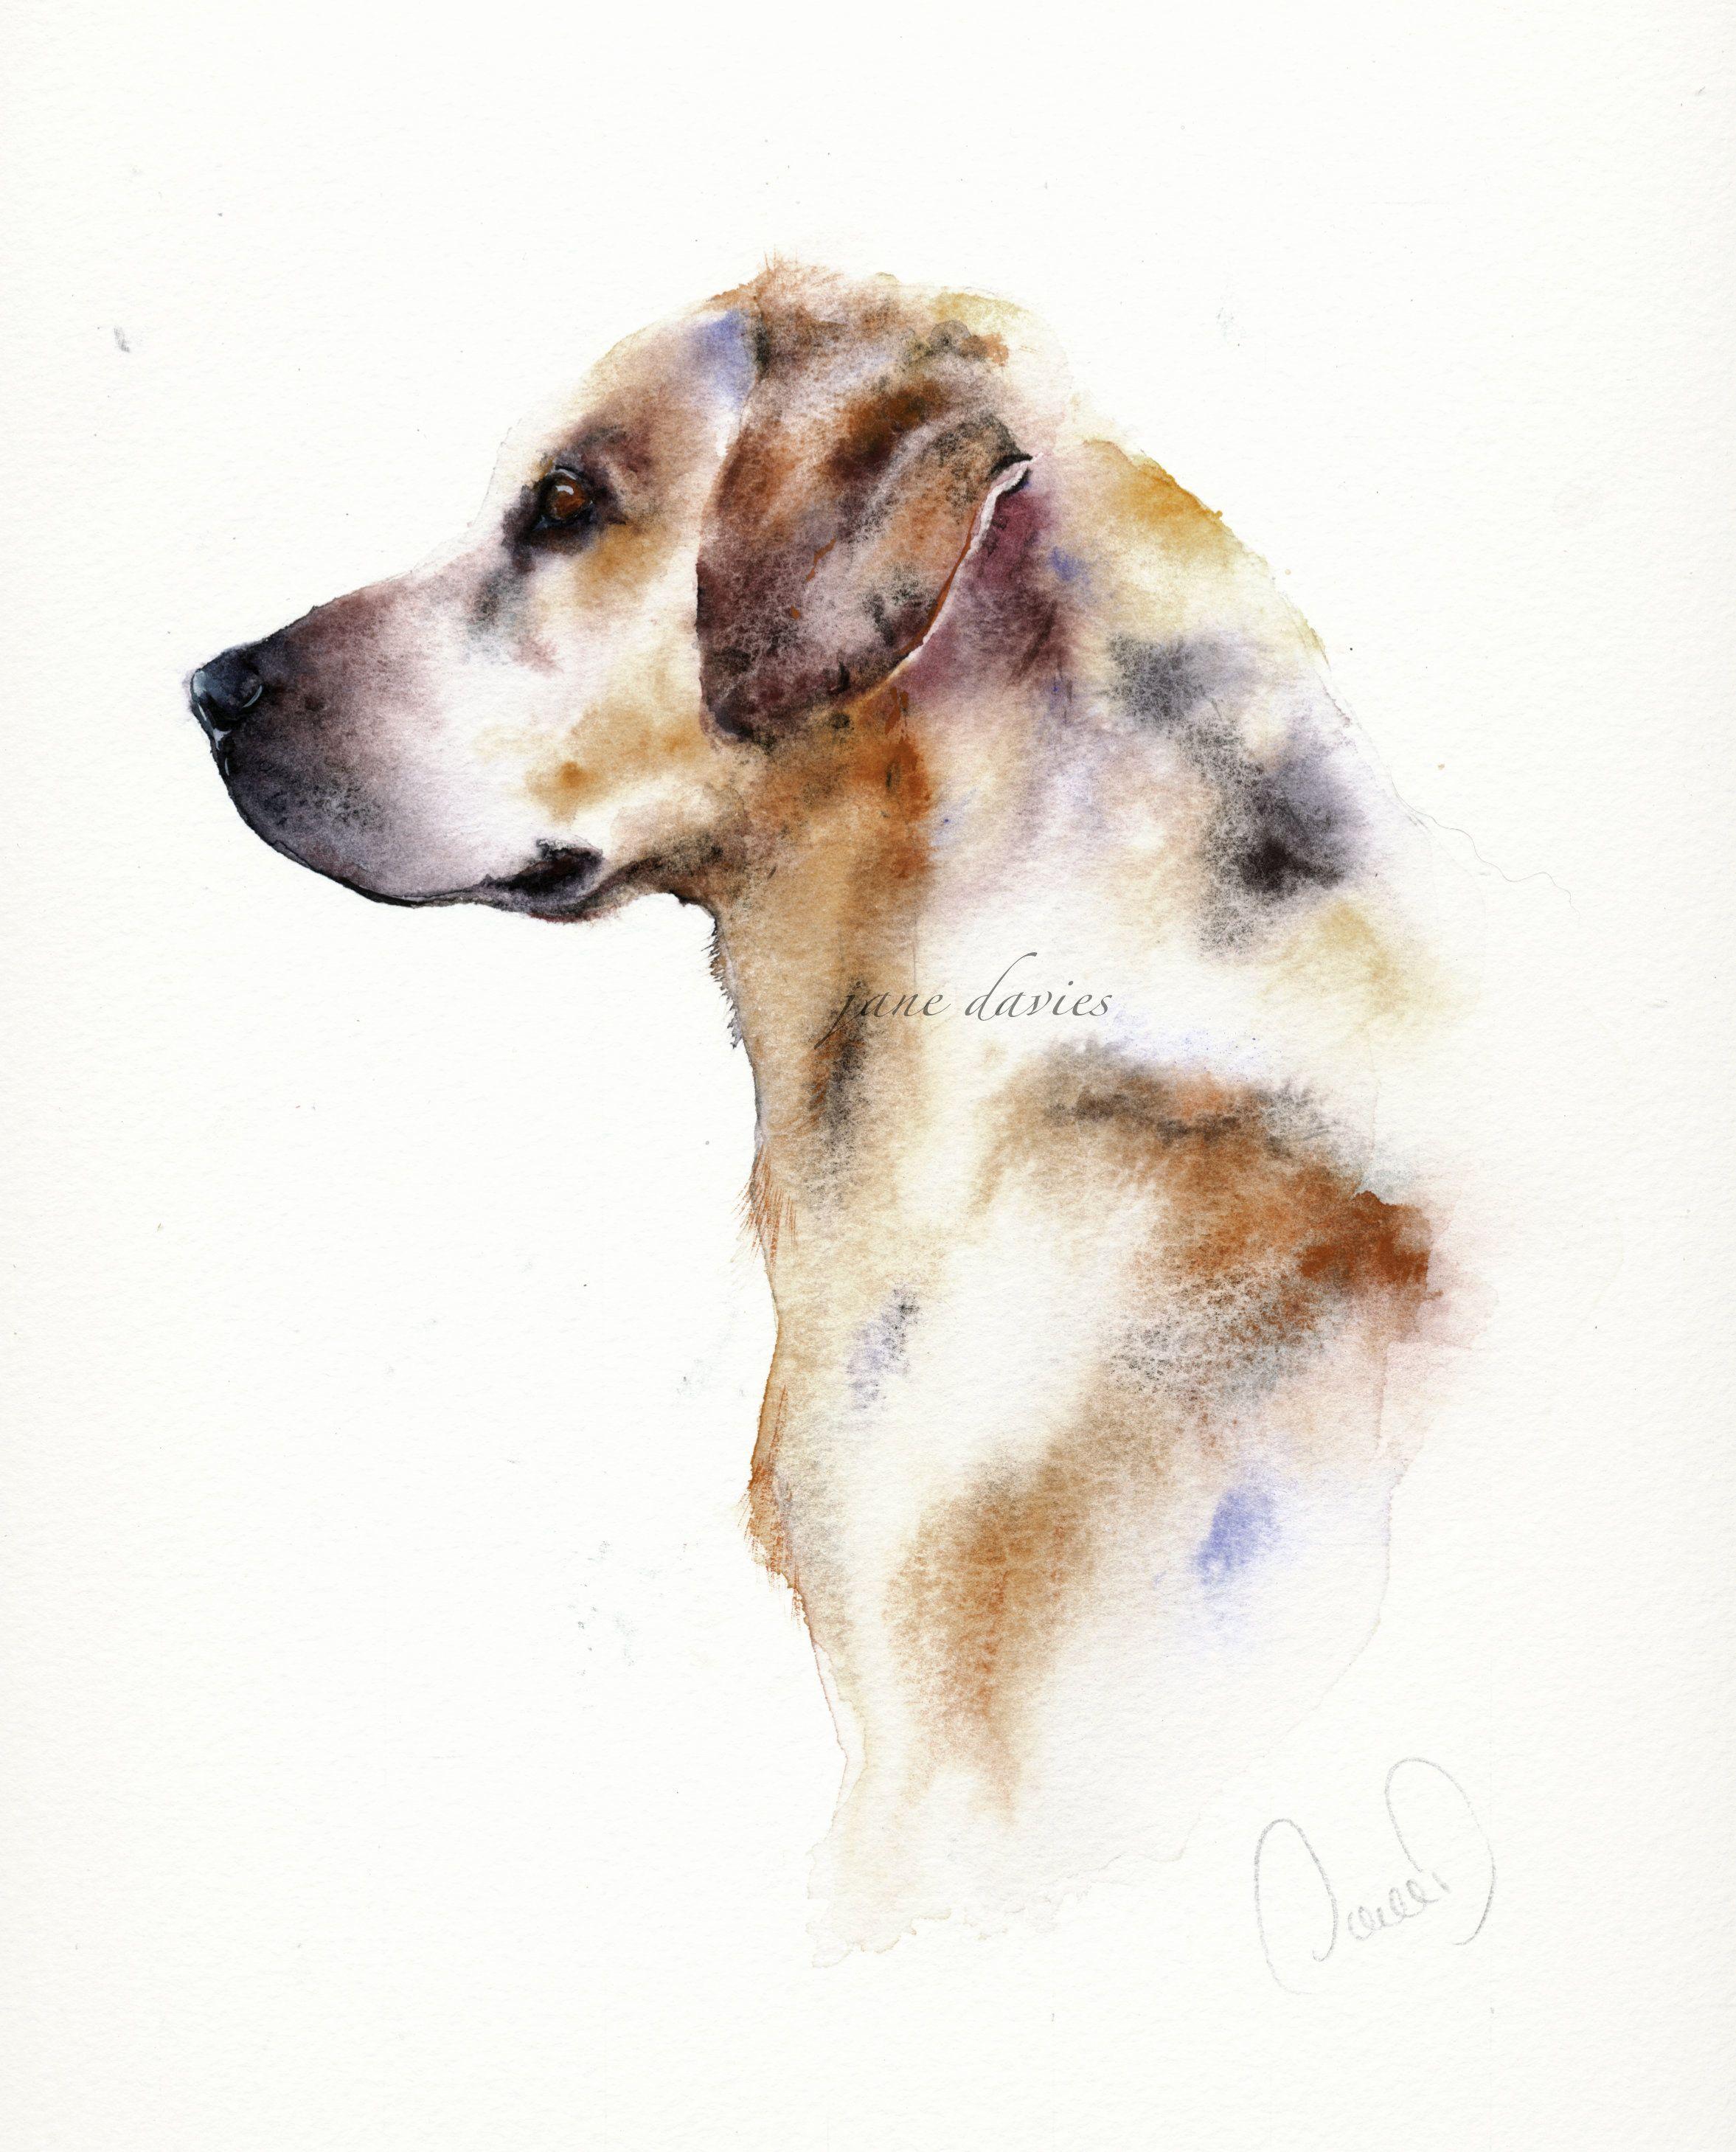 Capture the spirit of your pet with an original custom original watercolor pet portrait.